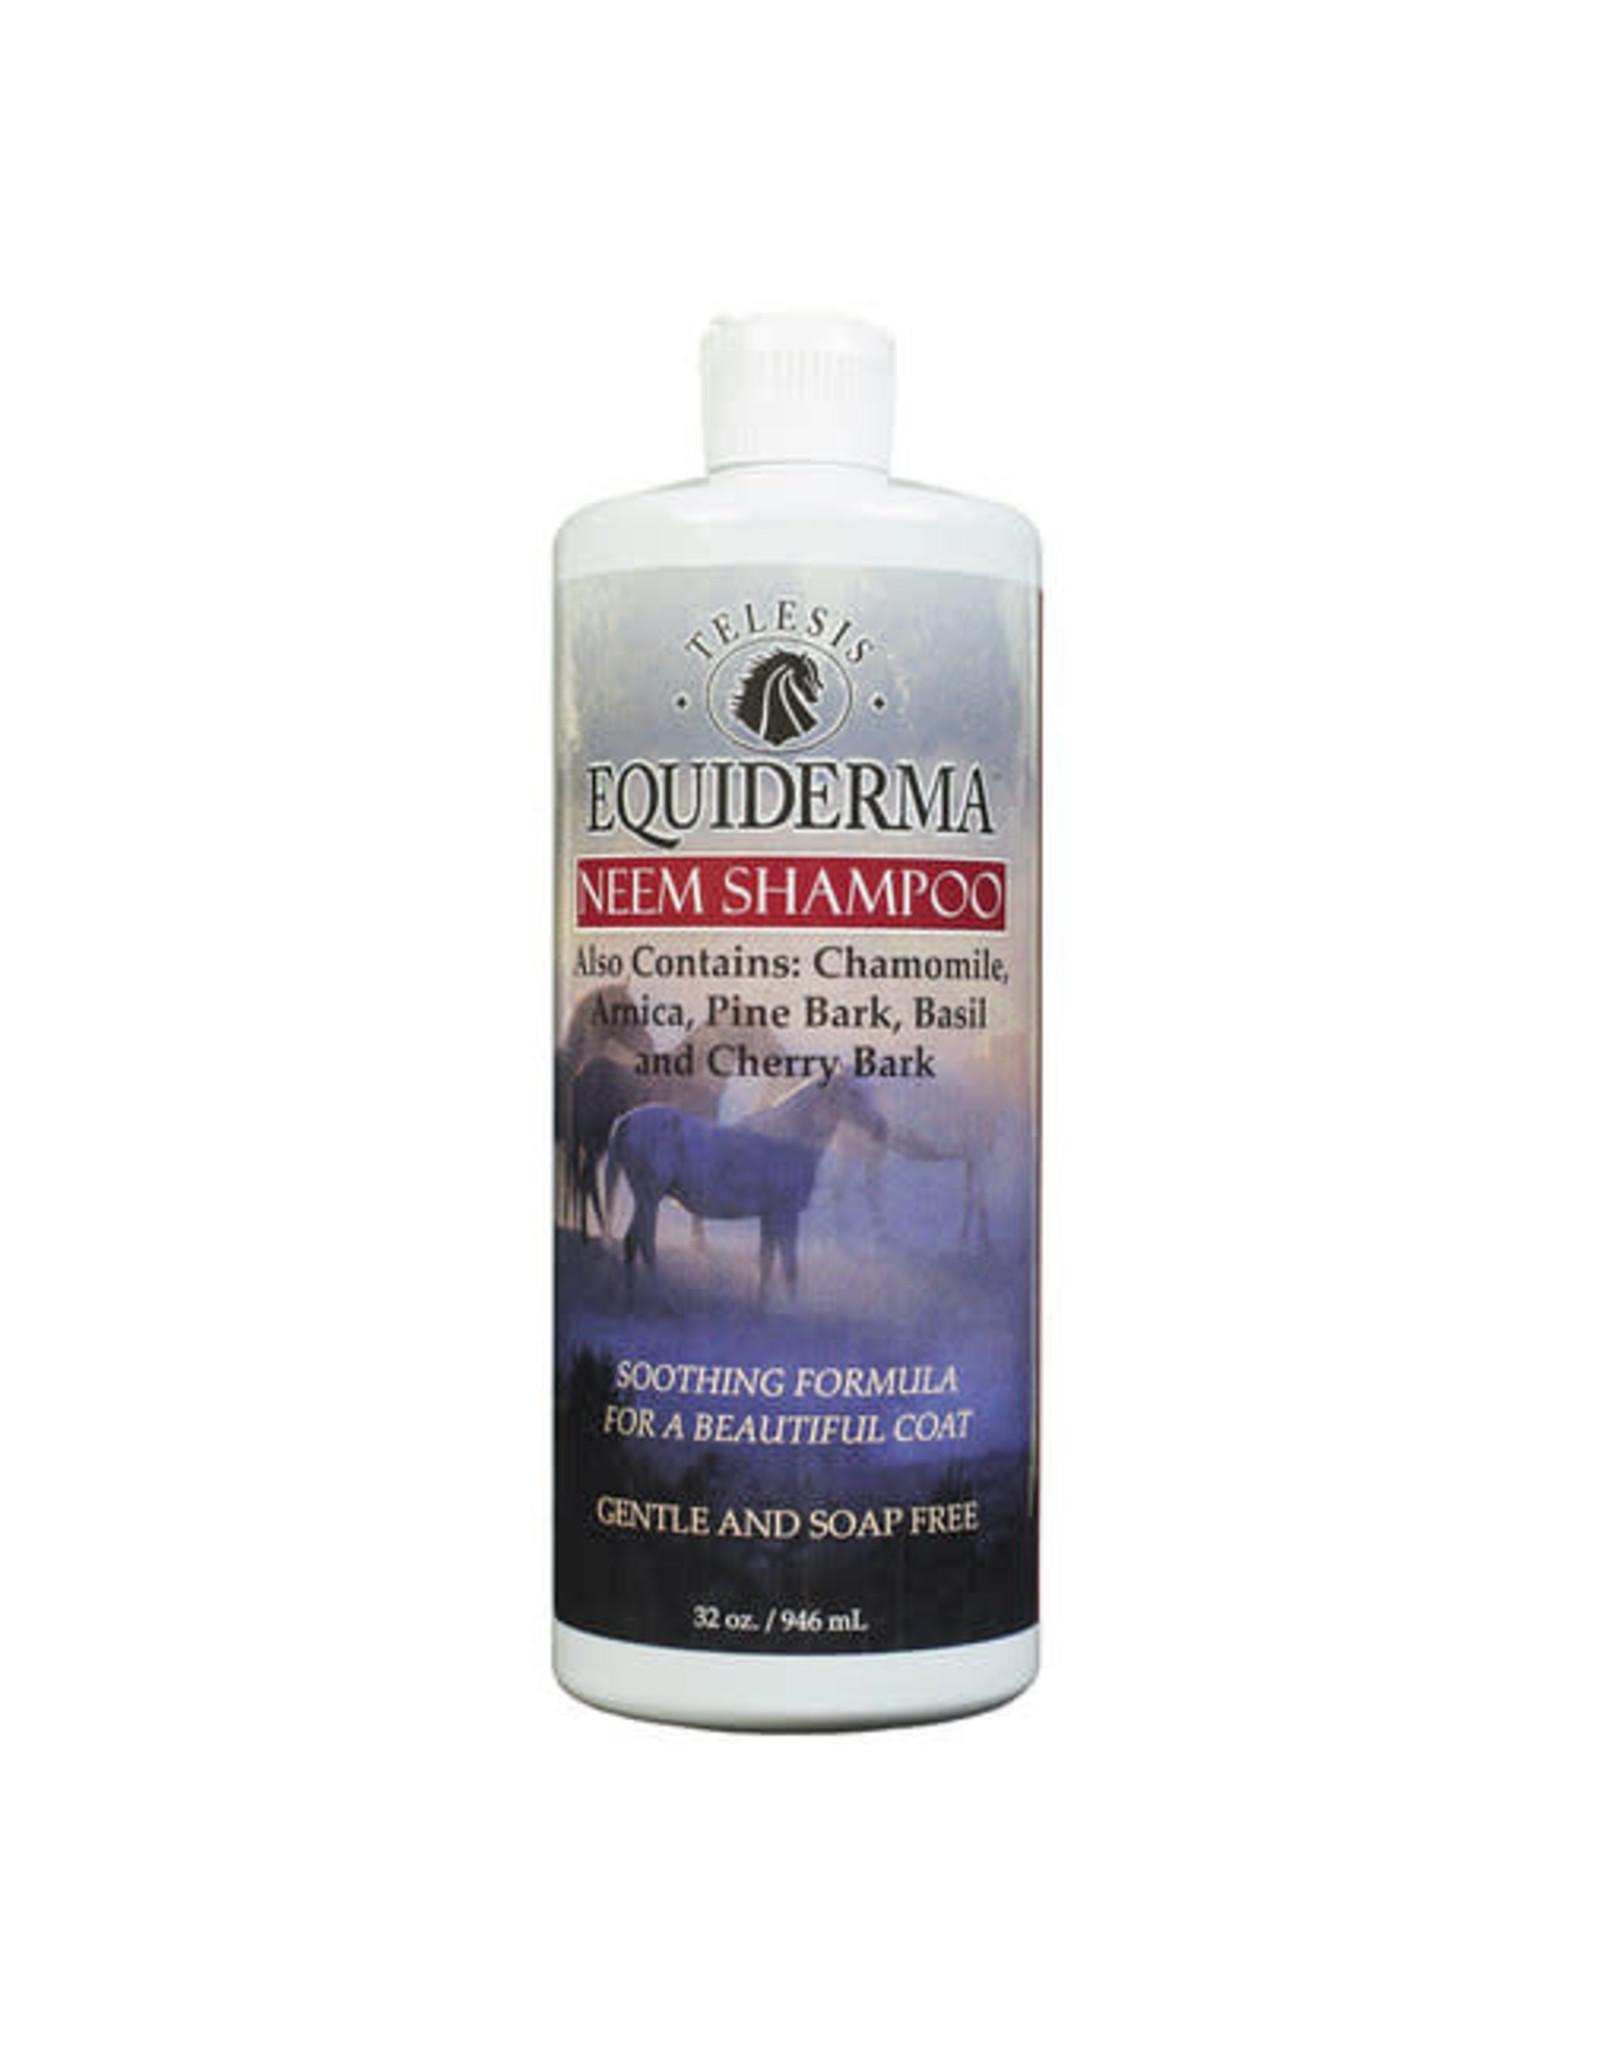 Equiderma Shampoo with Neem oil 32 oz